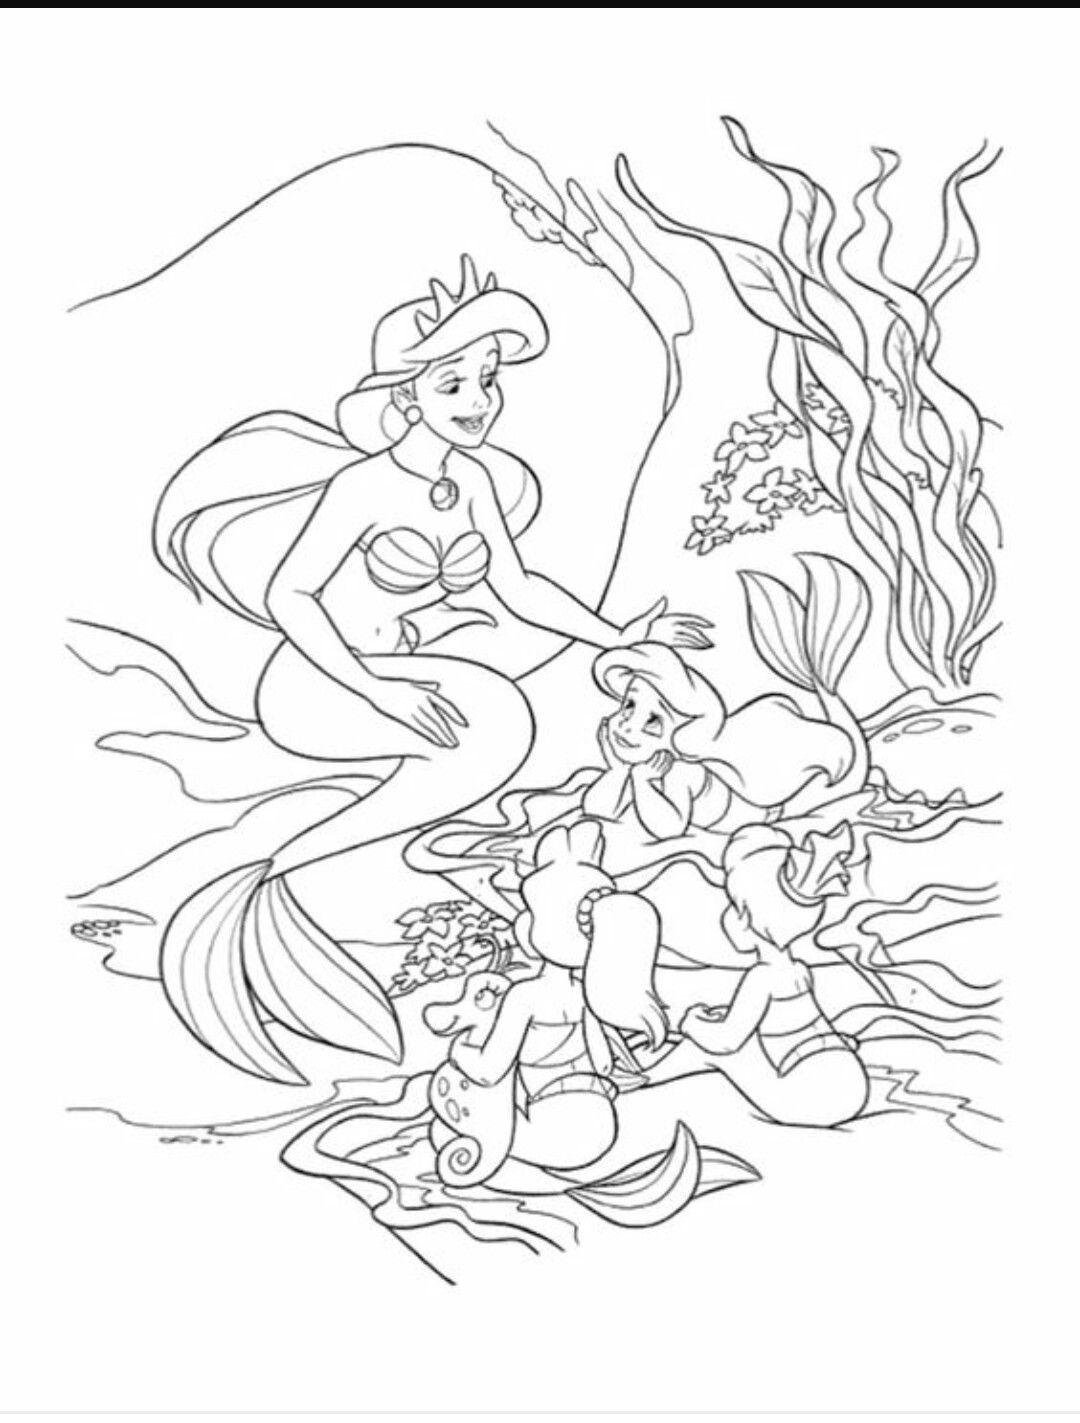 The Little Mermaid Iii Ariel S Beginning Coloring Page Ariel